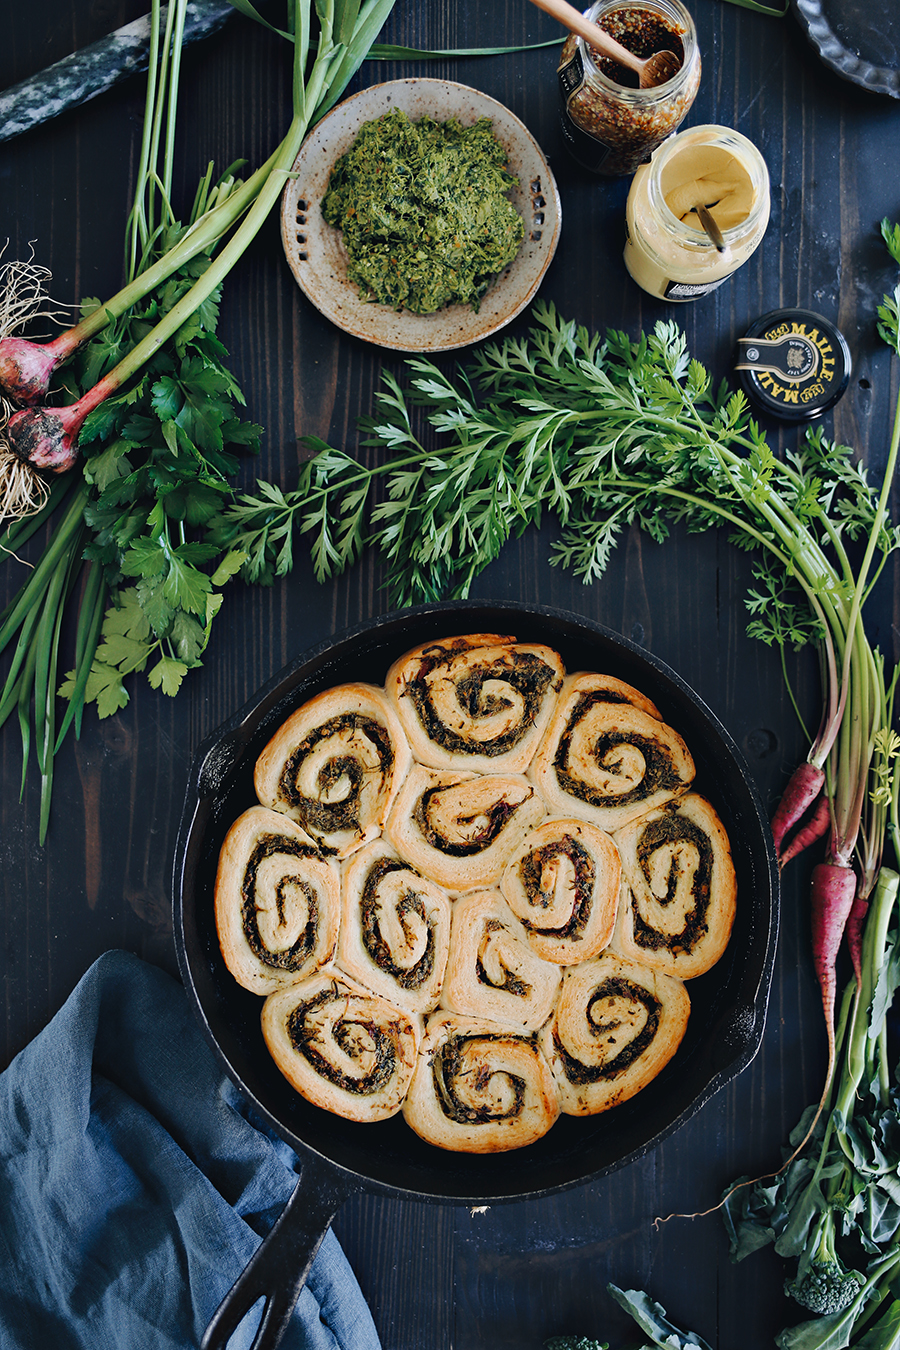 01_Carrot Top Pesto Spiral Rolls | Dine X Design.jpg